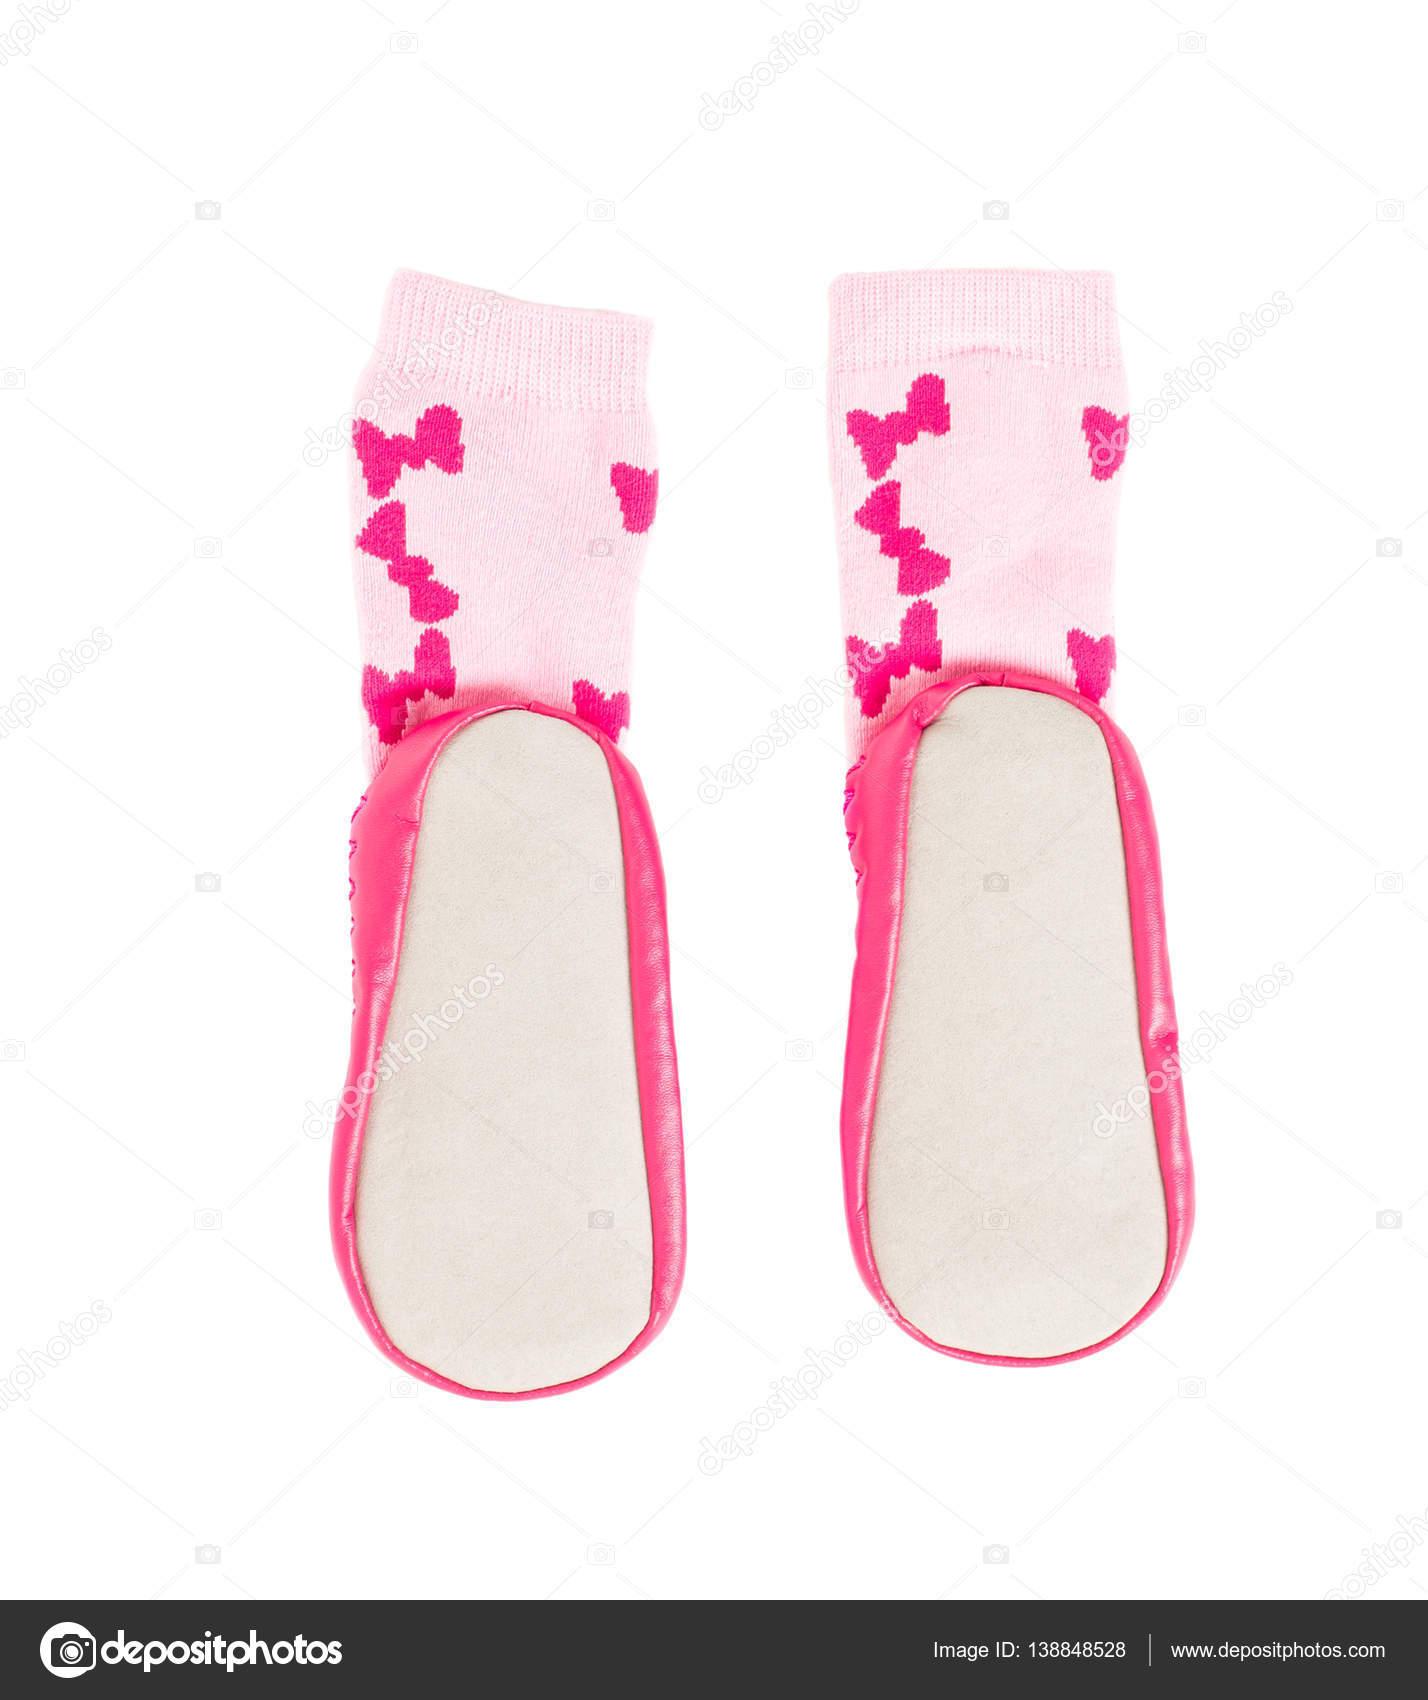 2064ea1f223 Ροζ μαλακά παπούτσια για μωρά — Φωτογραφία Αρχείου © indigolotos ...